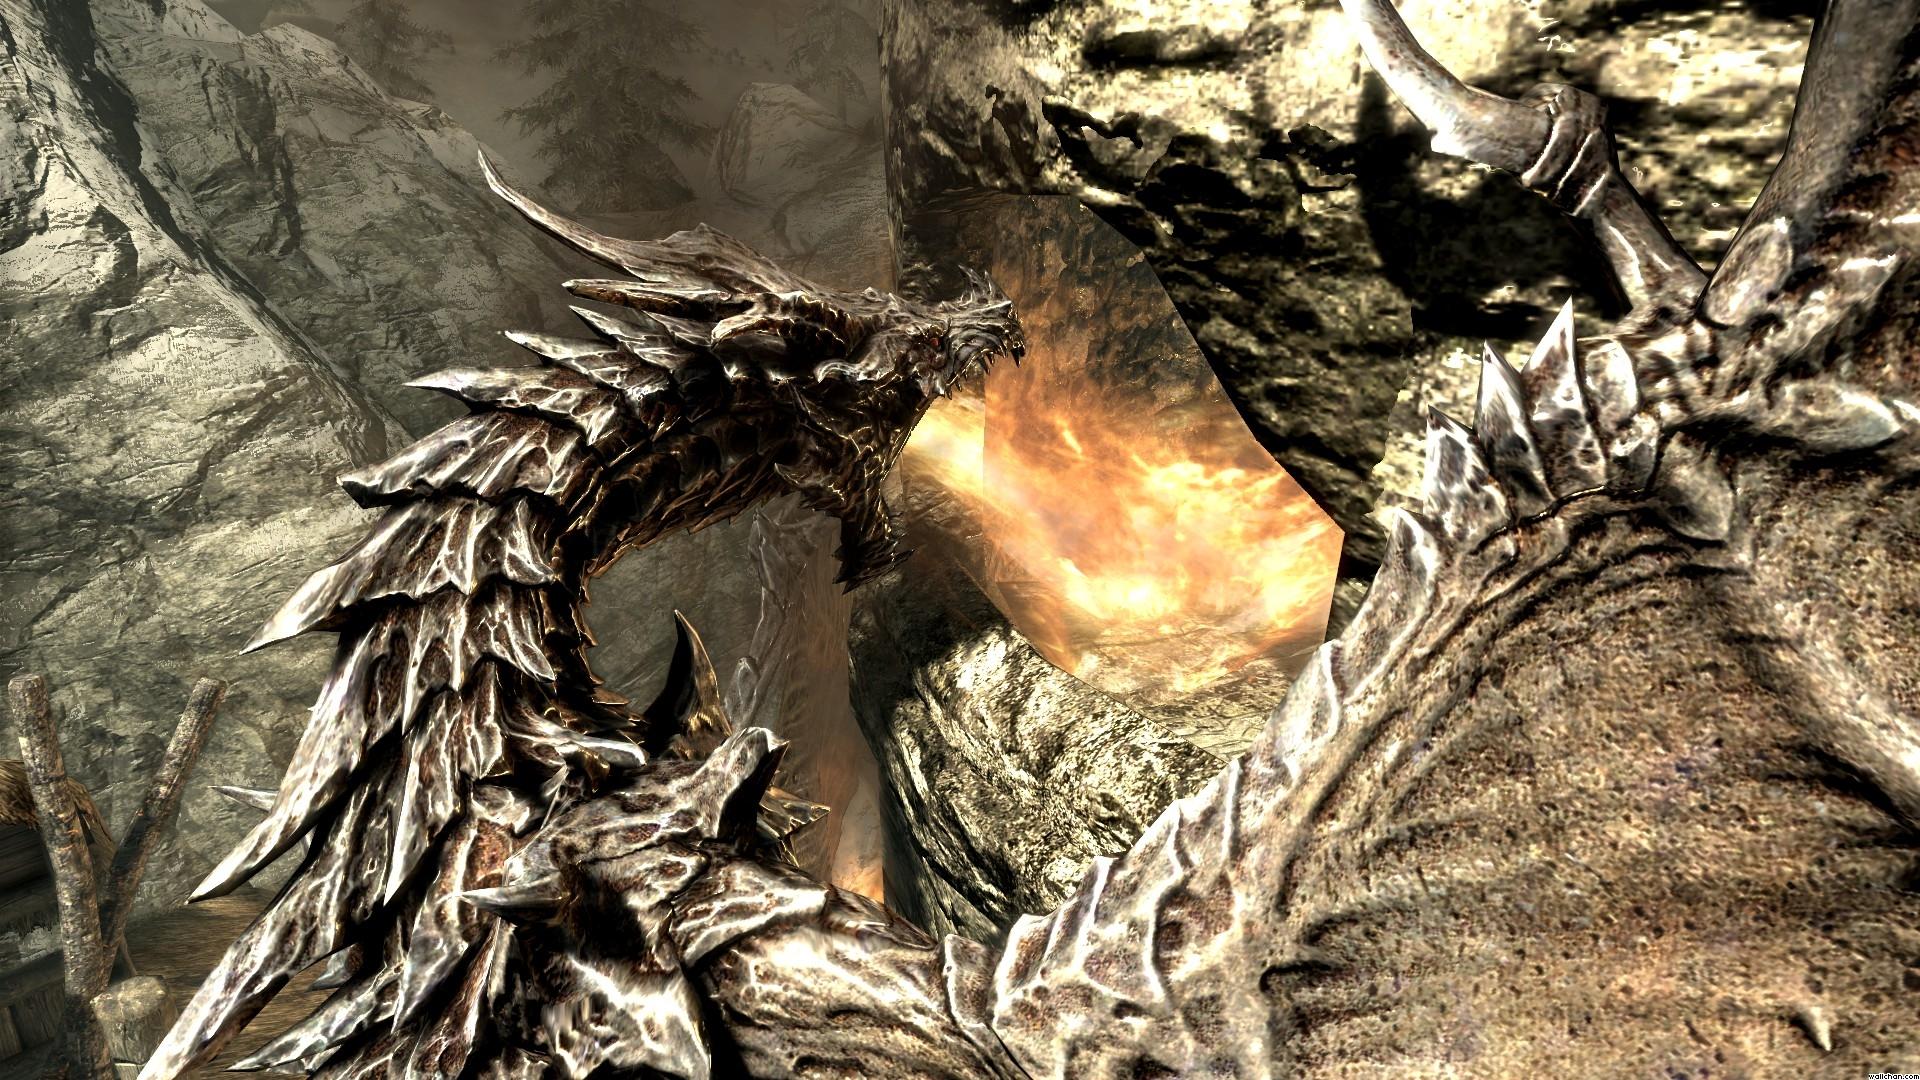 1366x768 dragon fire skyrim - photo #9